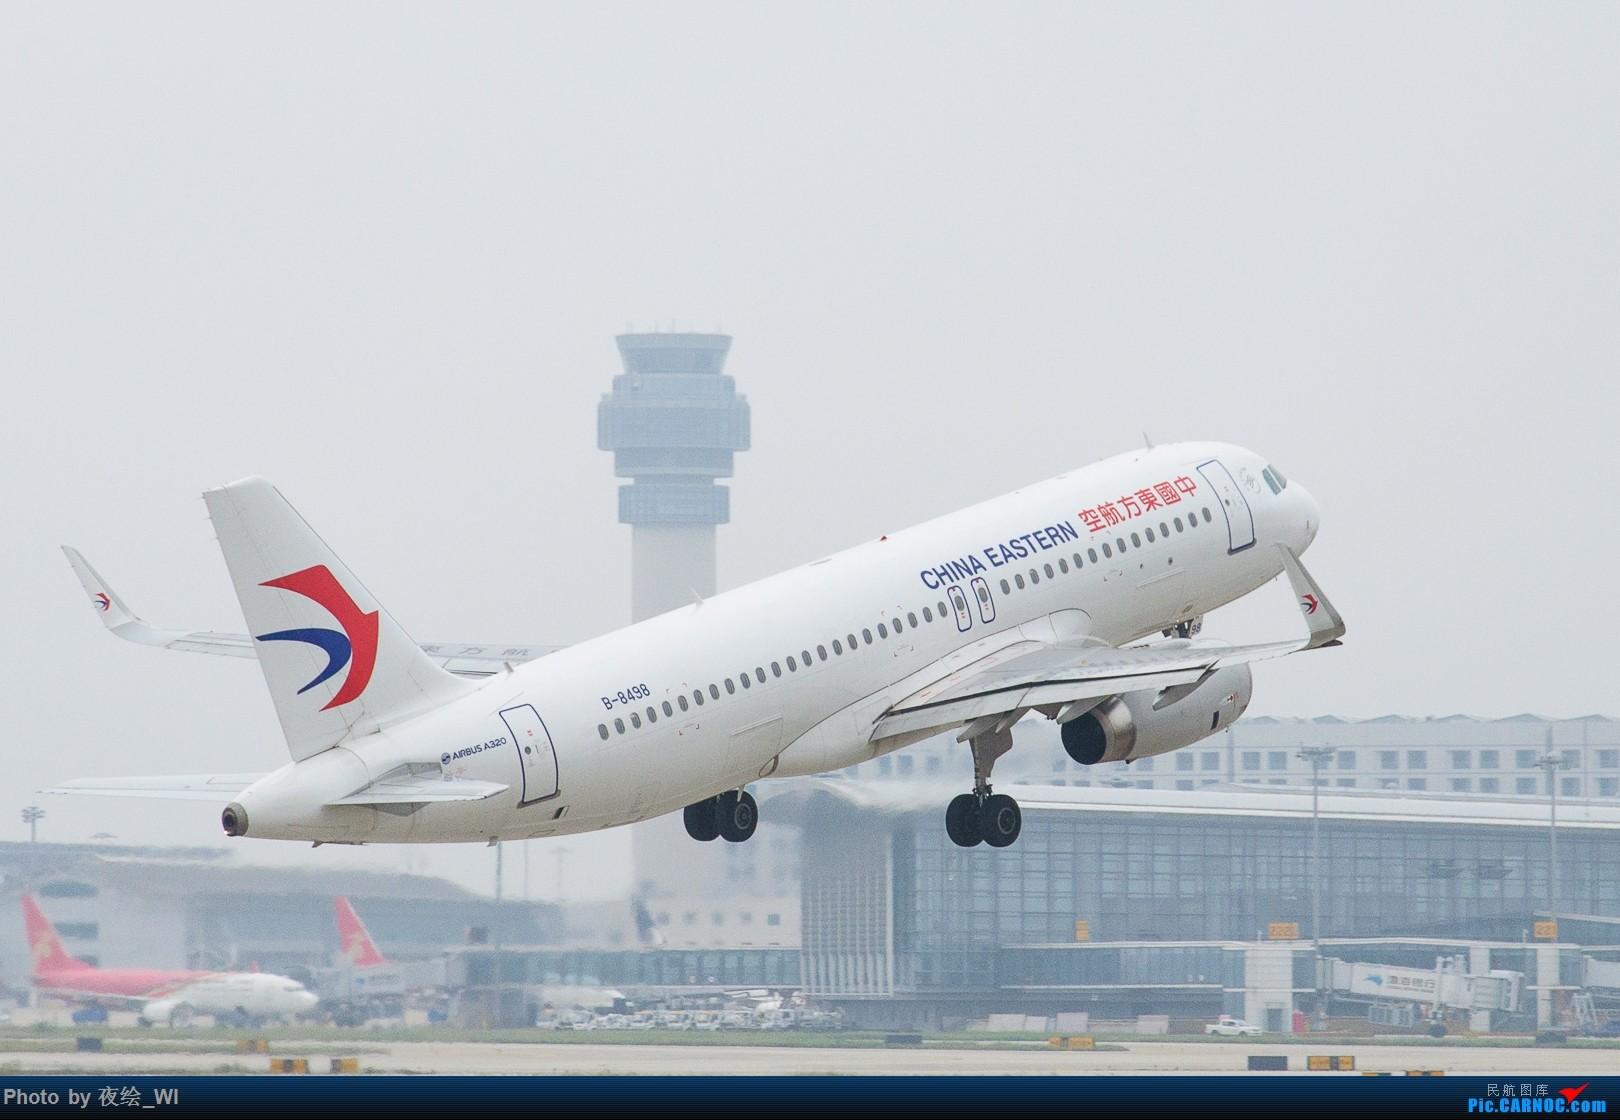 Re:[原创]【NKG】生日也要拍飞机,珍惜南京久违的单跑运行时光 AIRBUS A320-200 B-8498 中国南京禄口国际机场